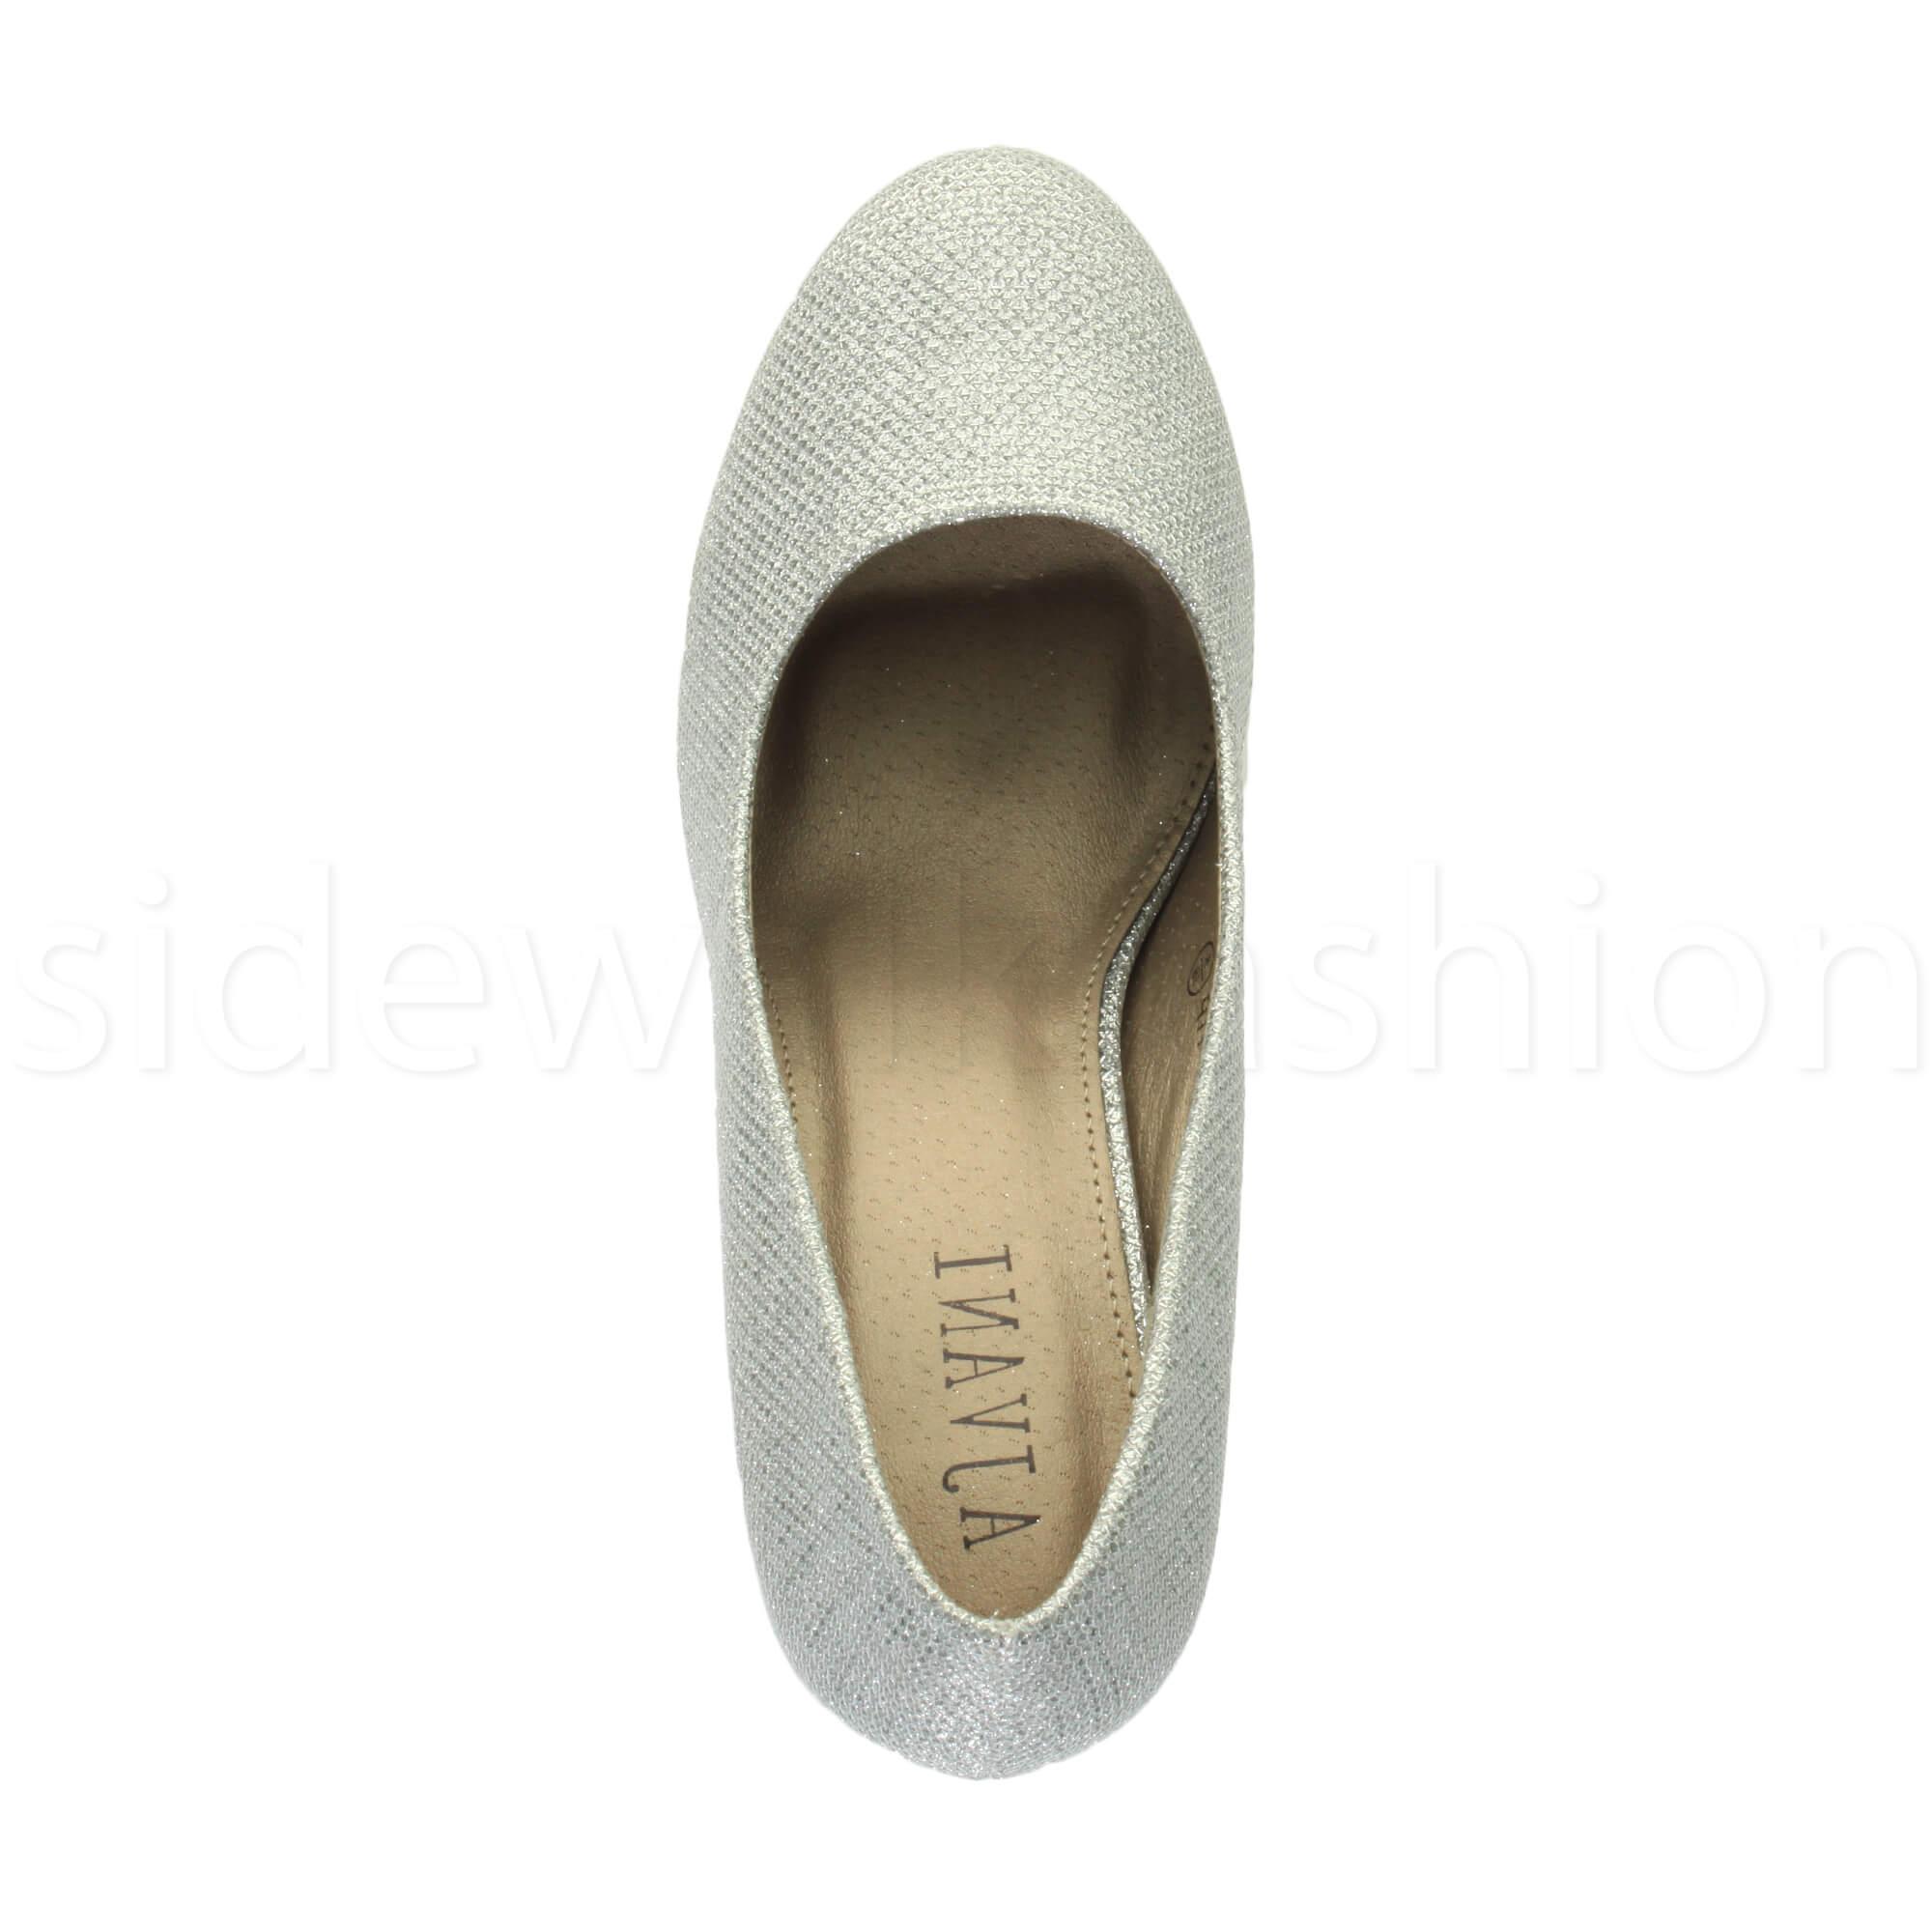 Womens-ladies-high-mid-heel-platform-wedding-evening-bridesmaid-court-shoes-size thumbnail 175